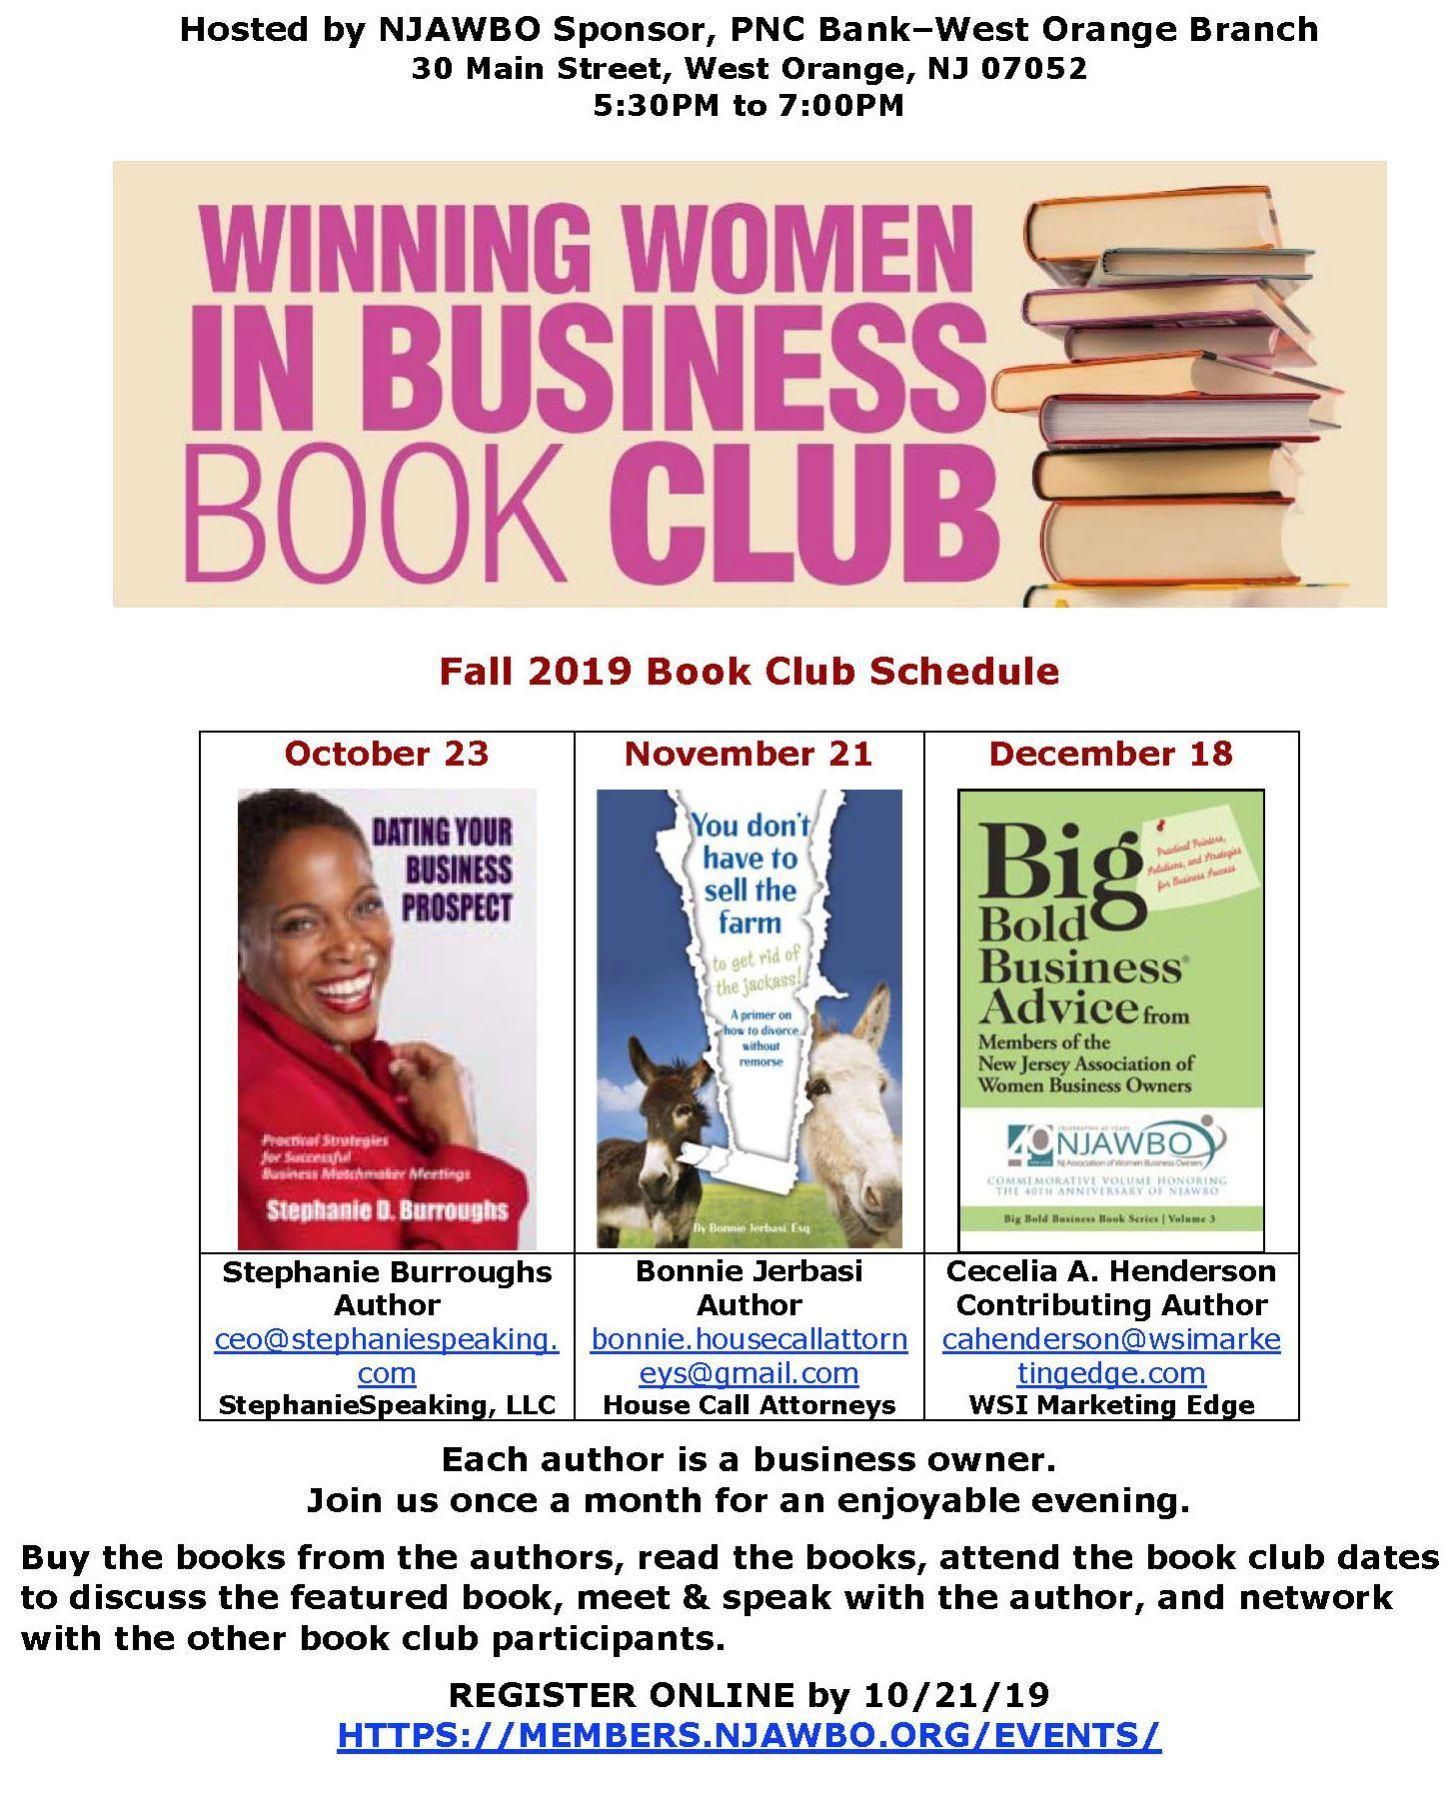 NJAWBO/PNC Bank - West Orange Business Book Club GZ Events